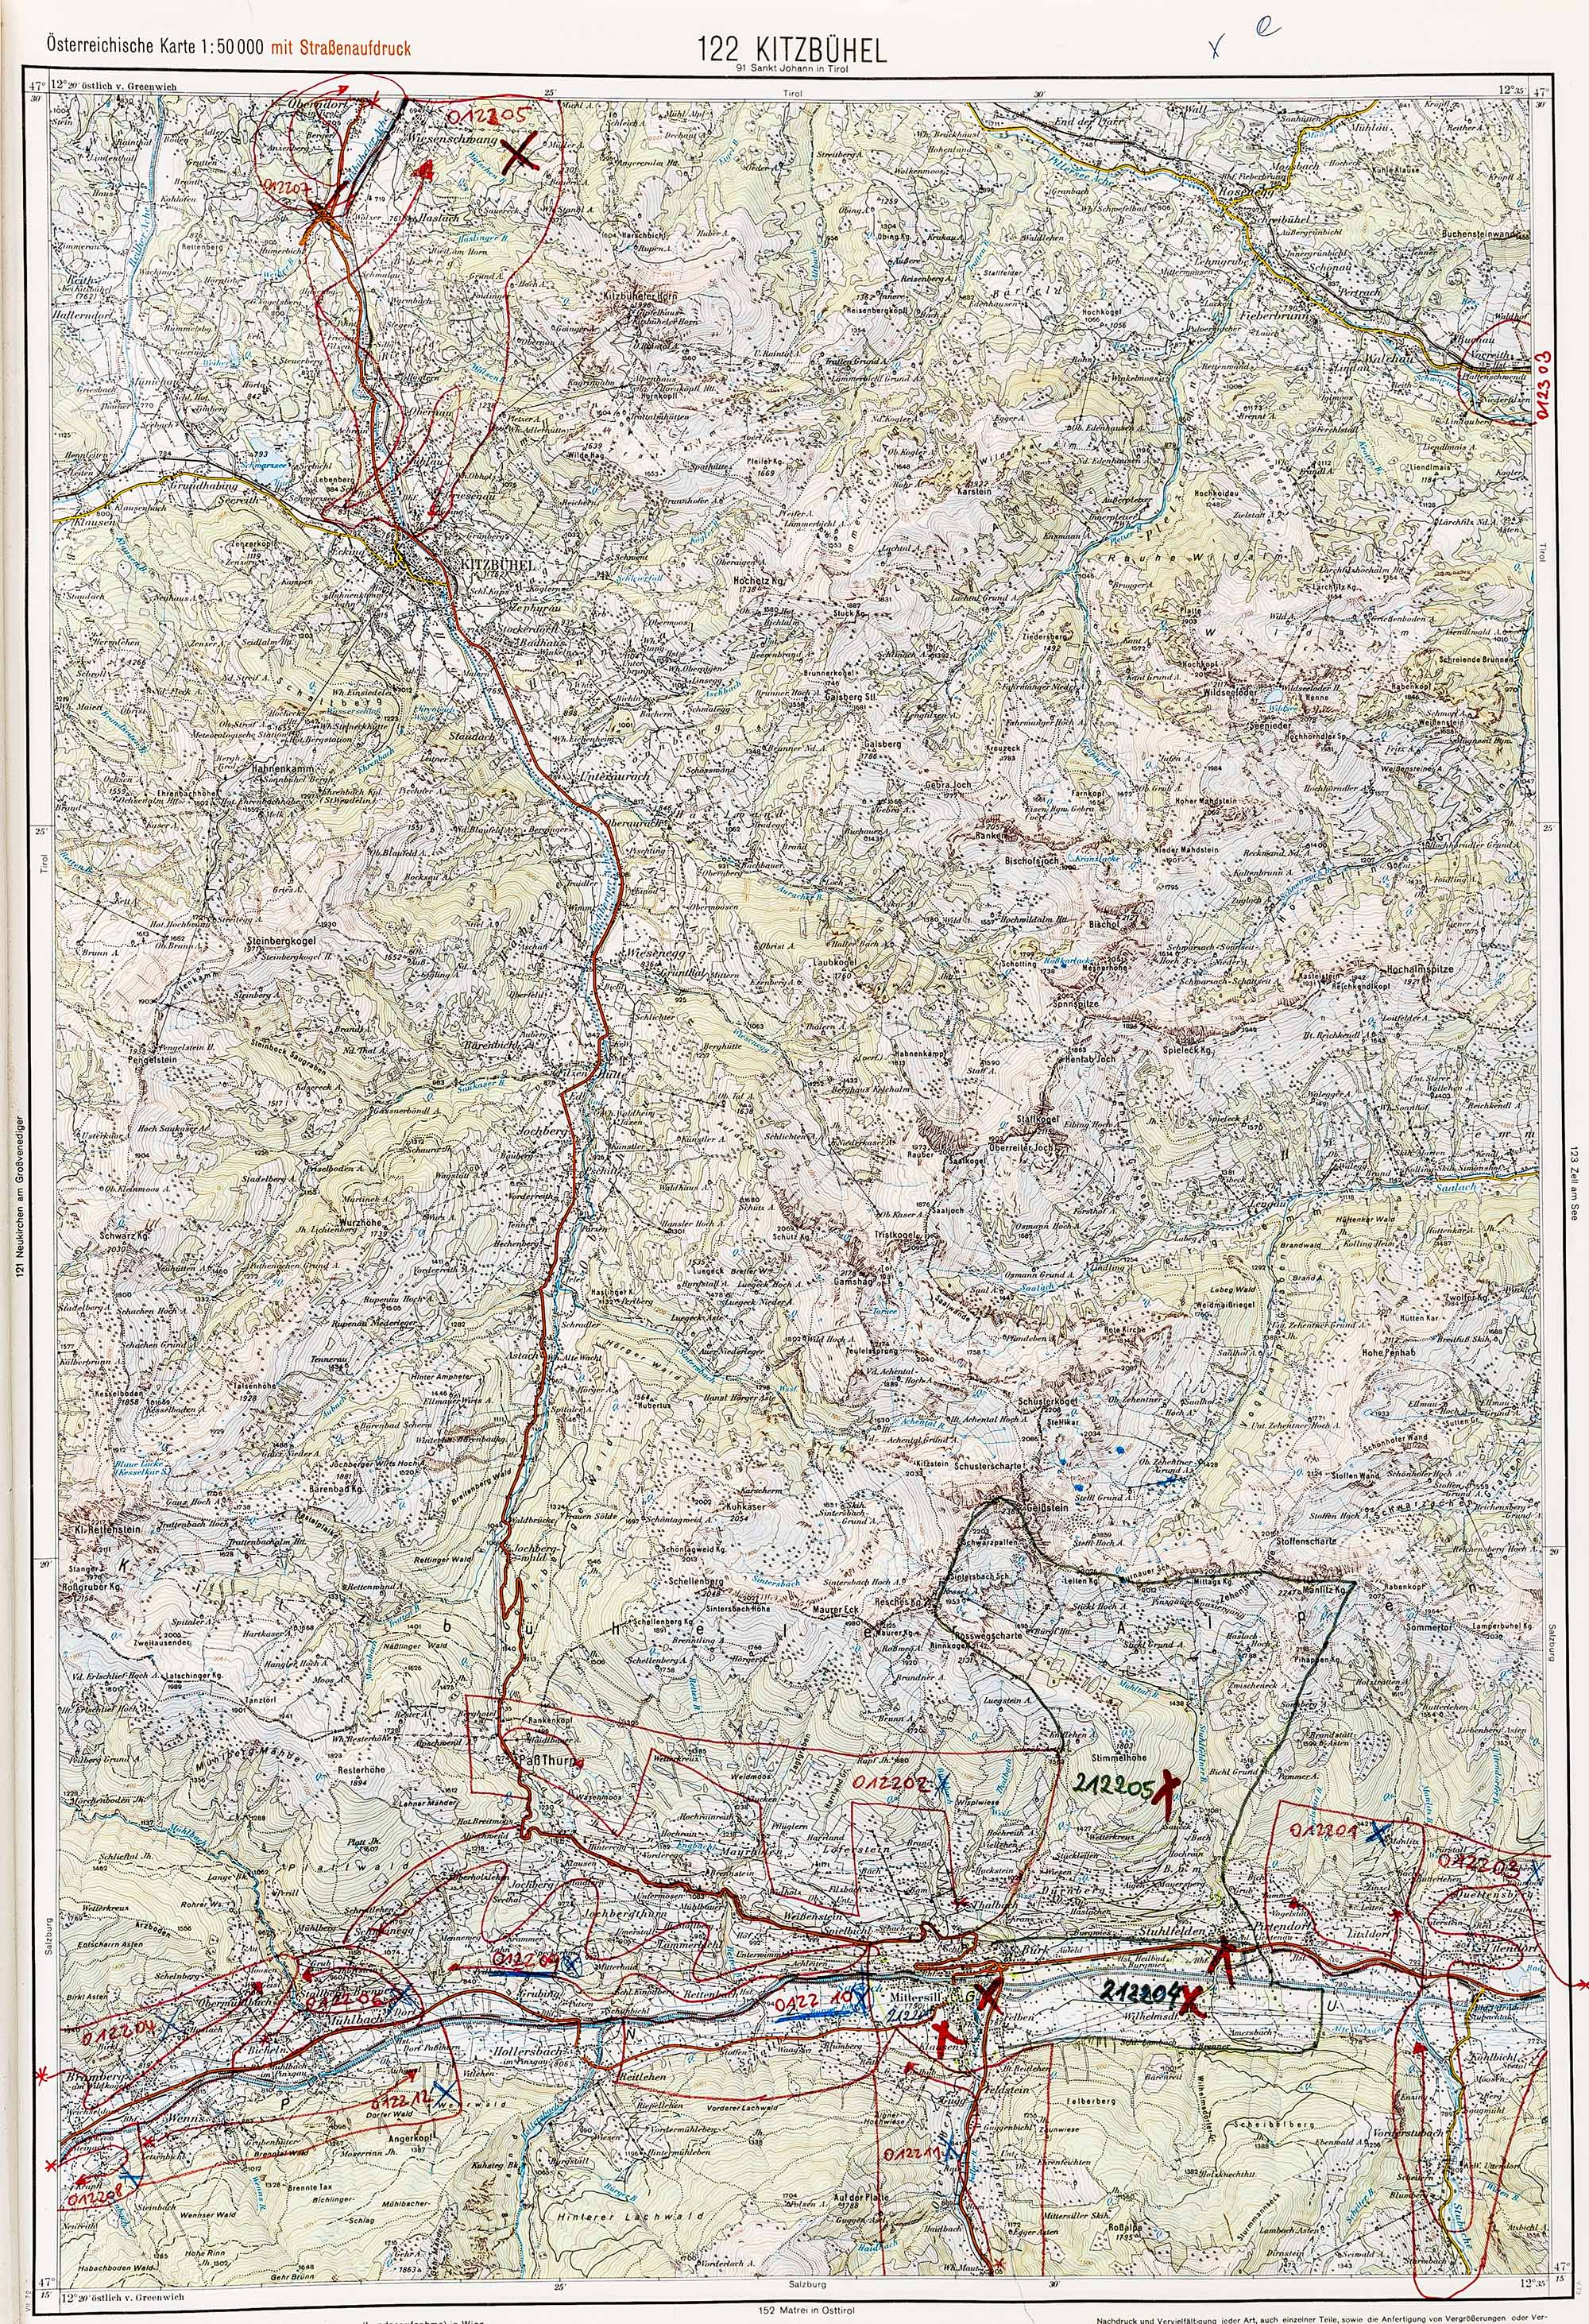 1979-1982 Karte 122